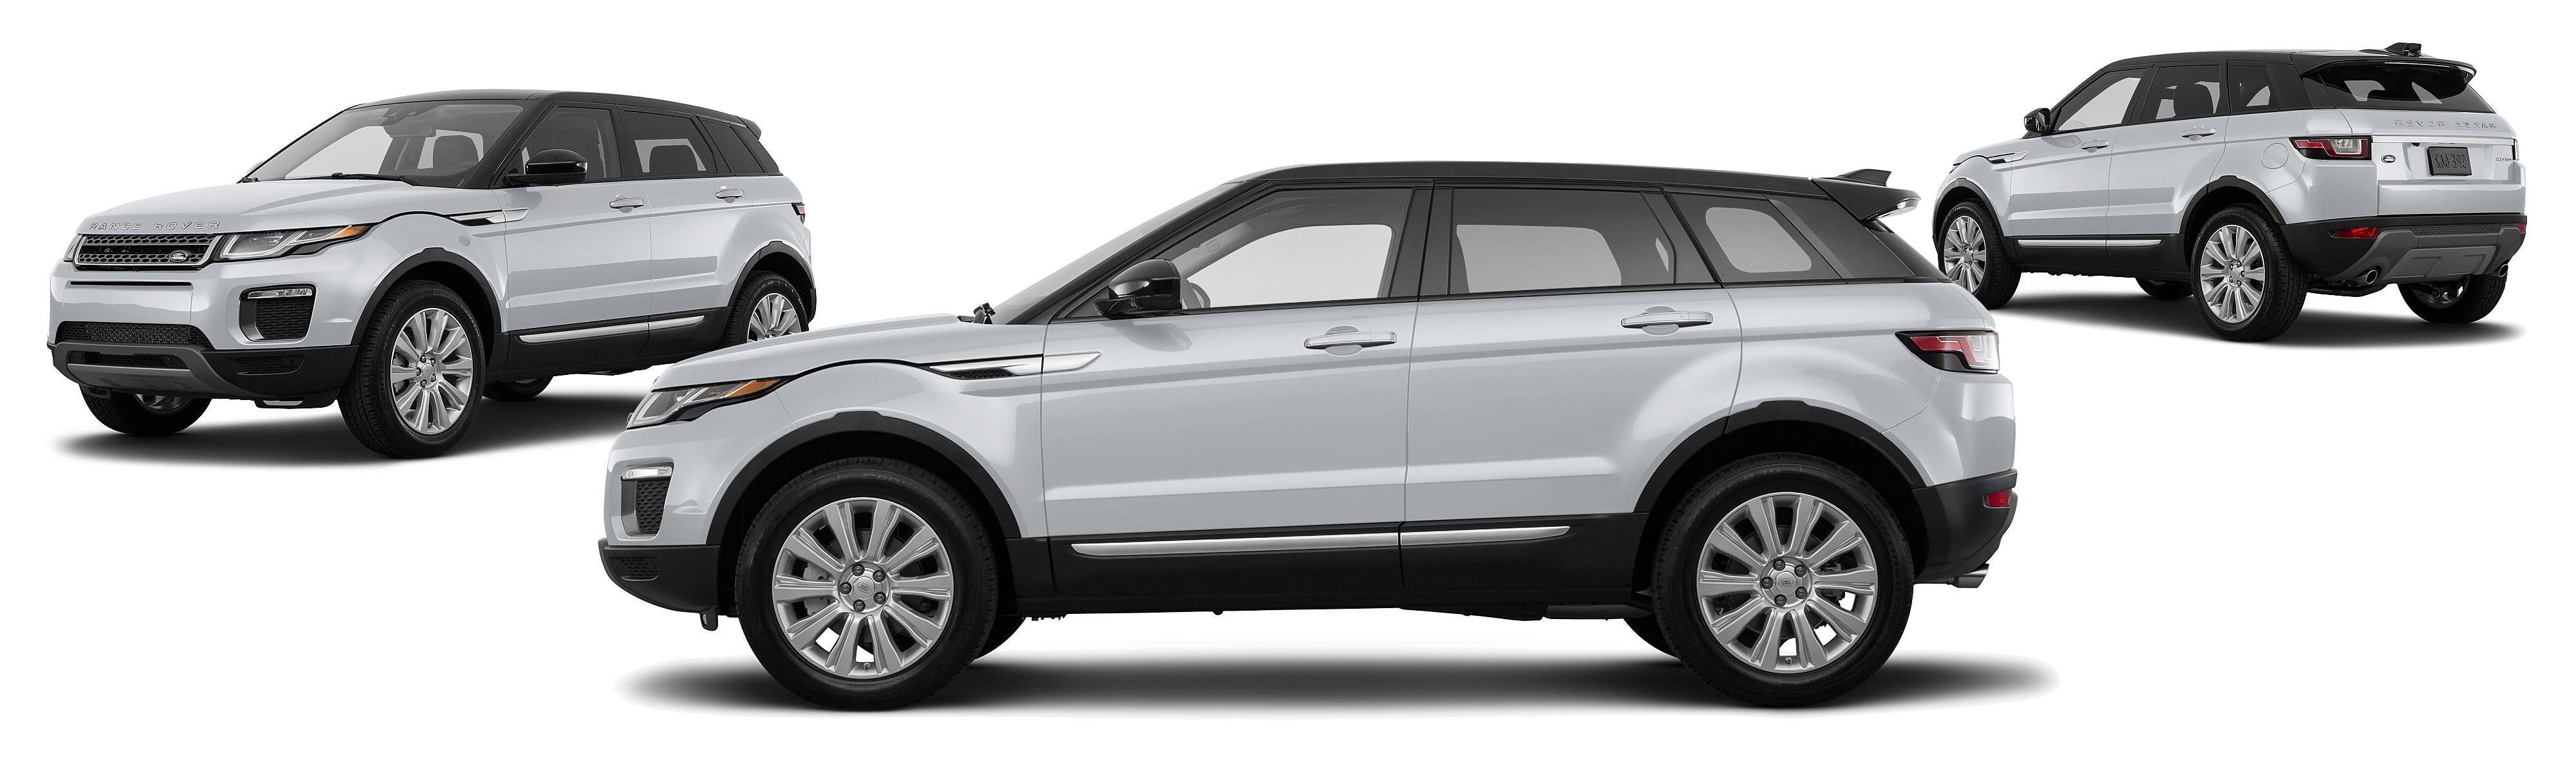 2017 Land Rover Range Rover Evoque AWD HSE Dynamic 4dr SUV